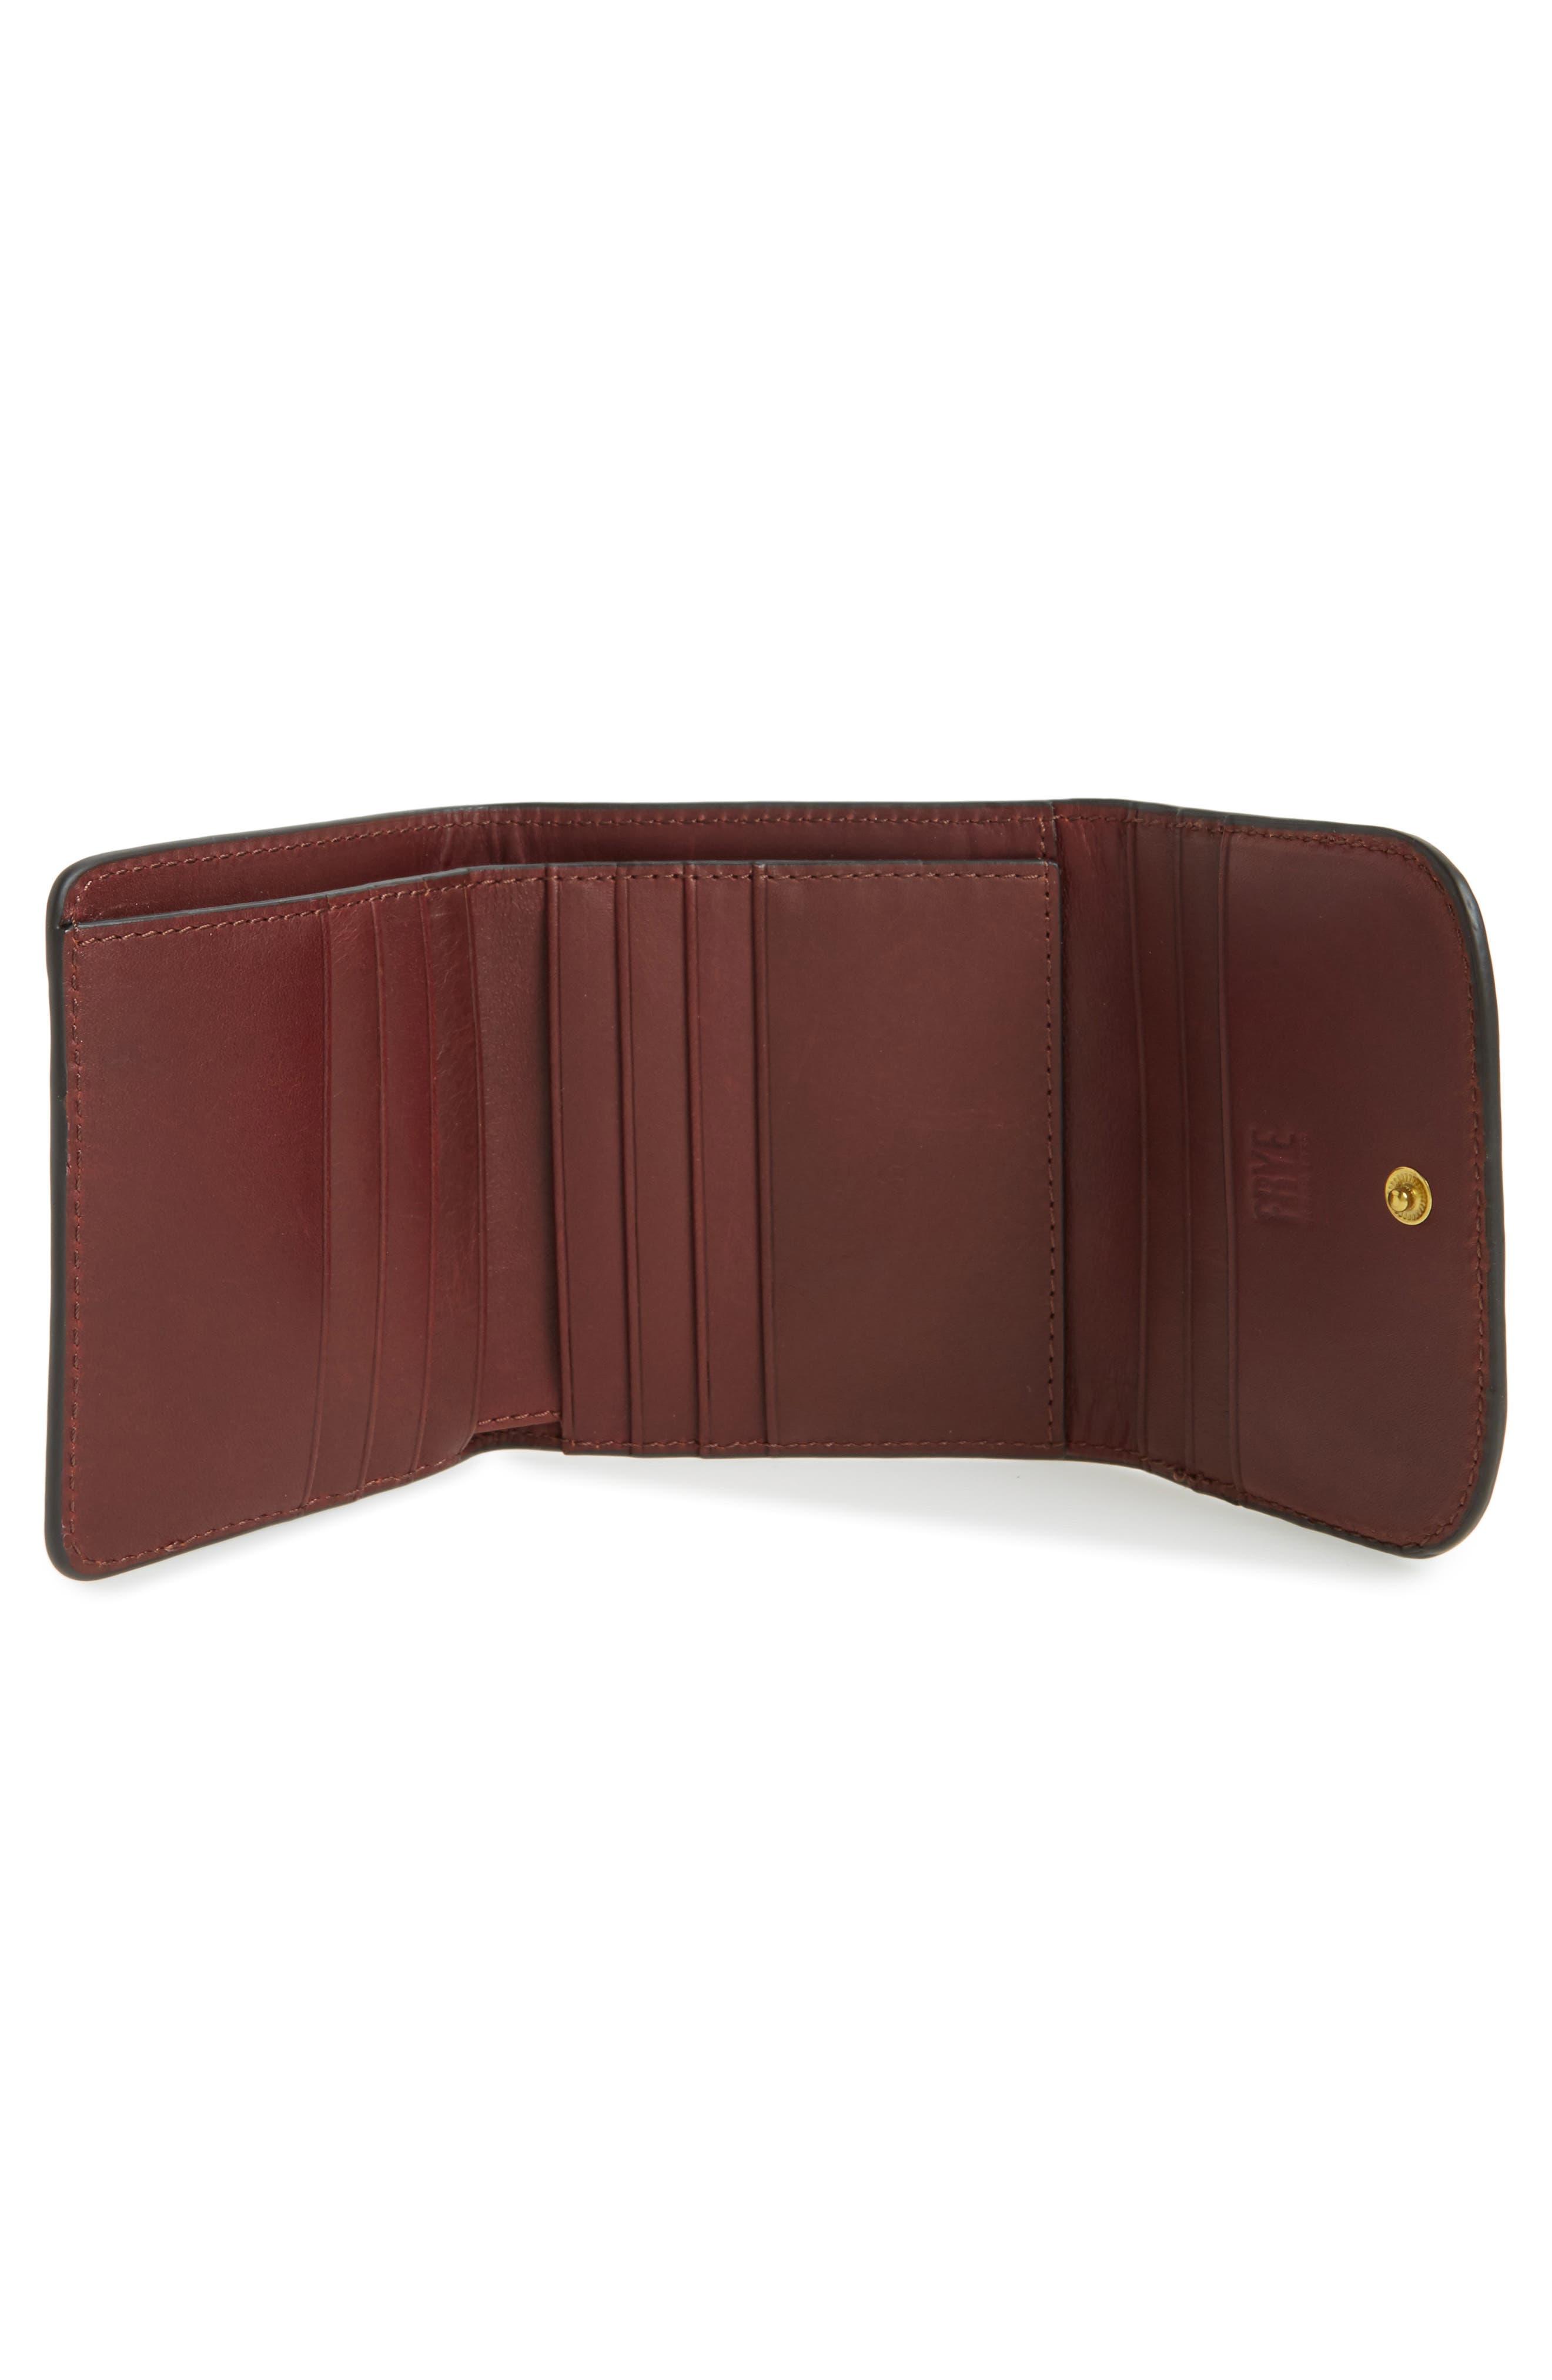 Medium Campus Rivet Leather Wallet,                             Alternate thumbnail 2, color,                             210